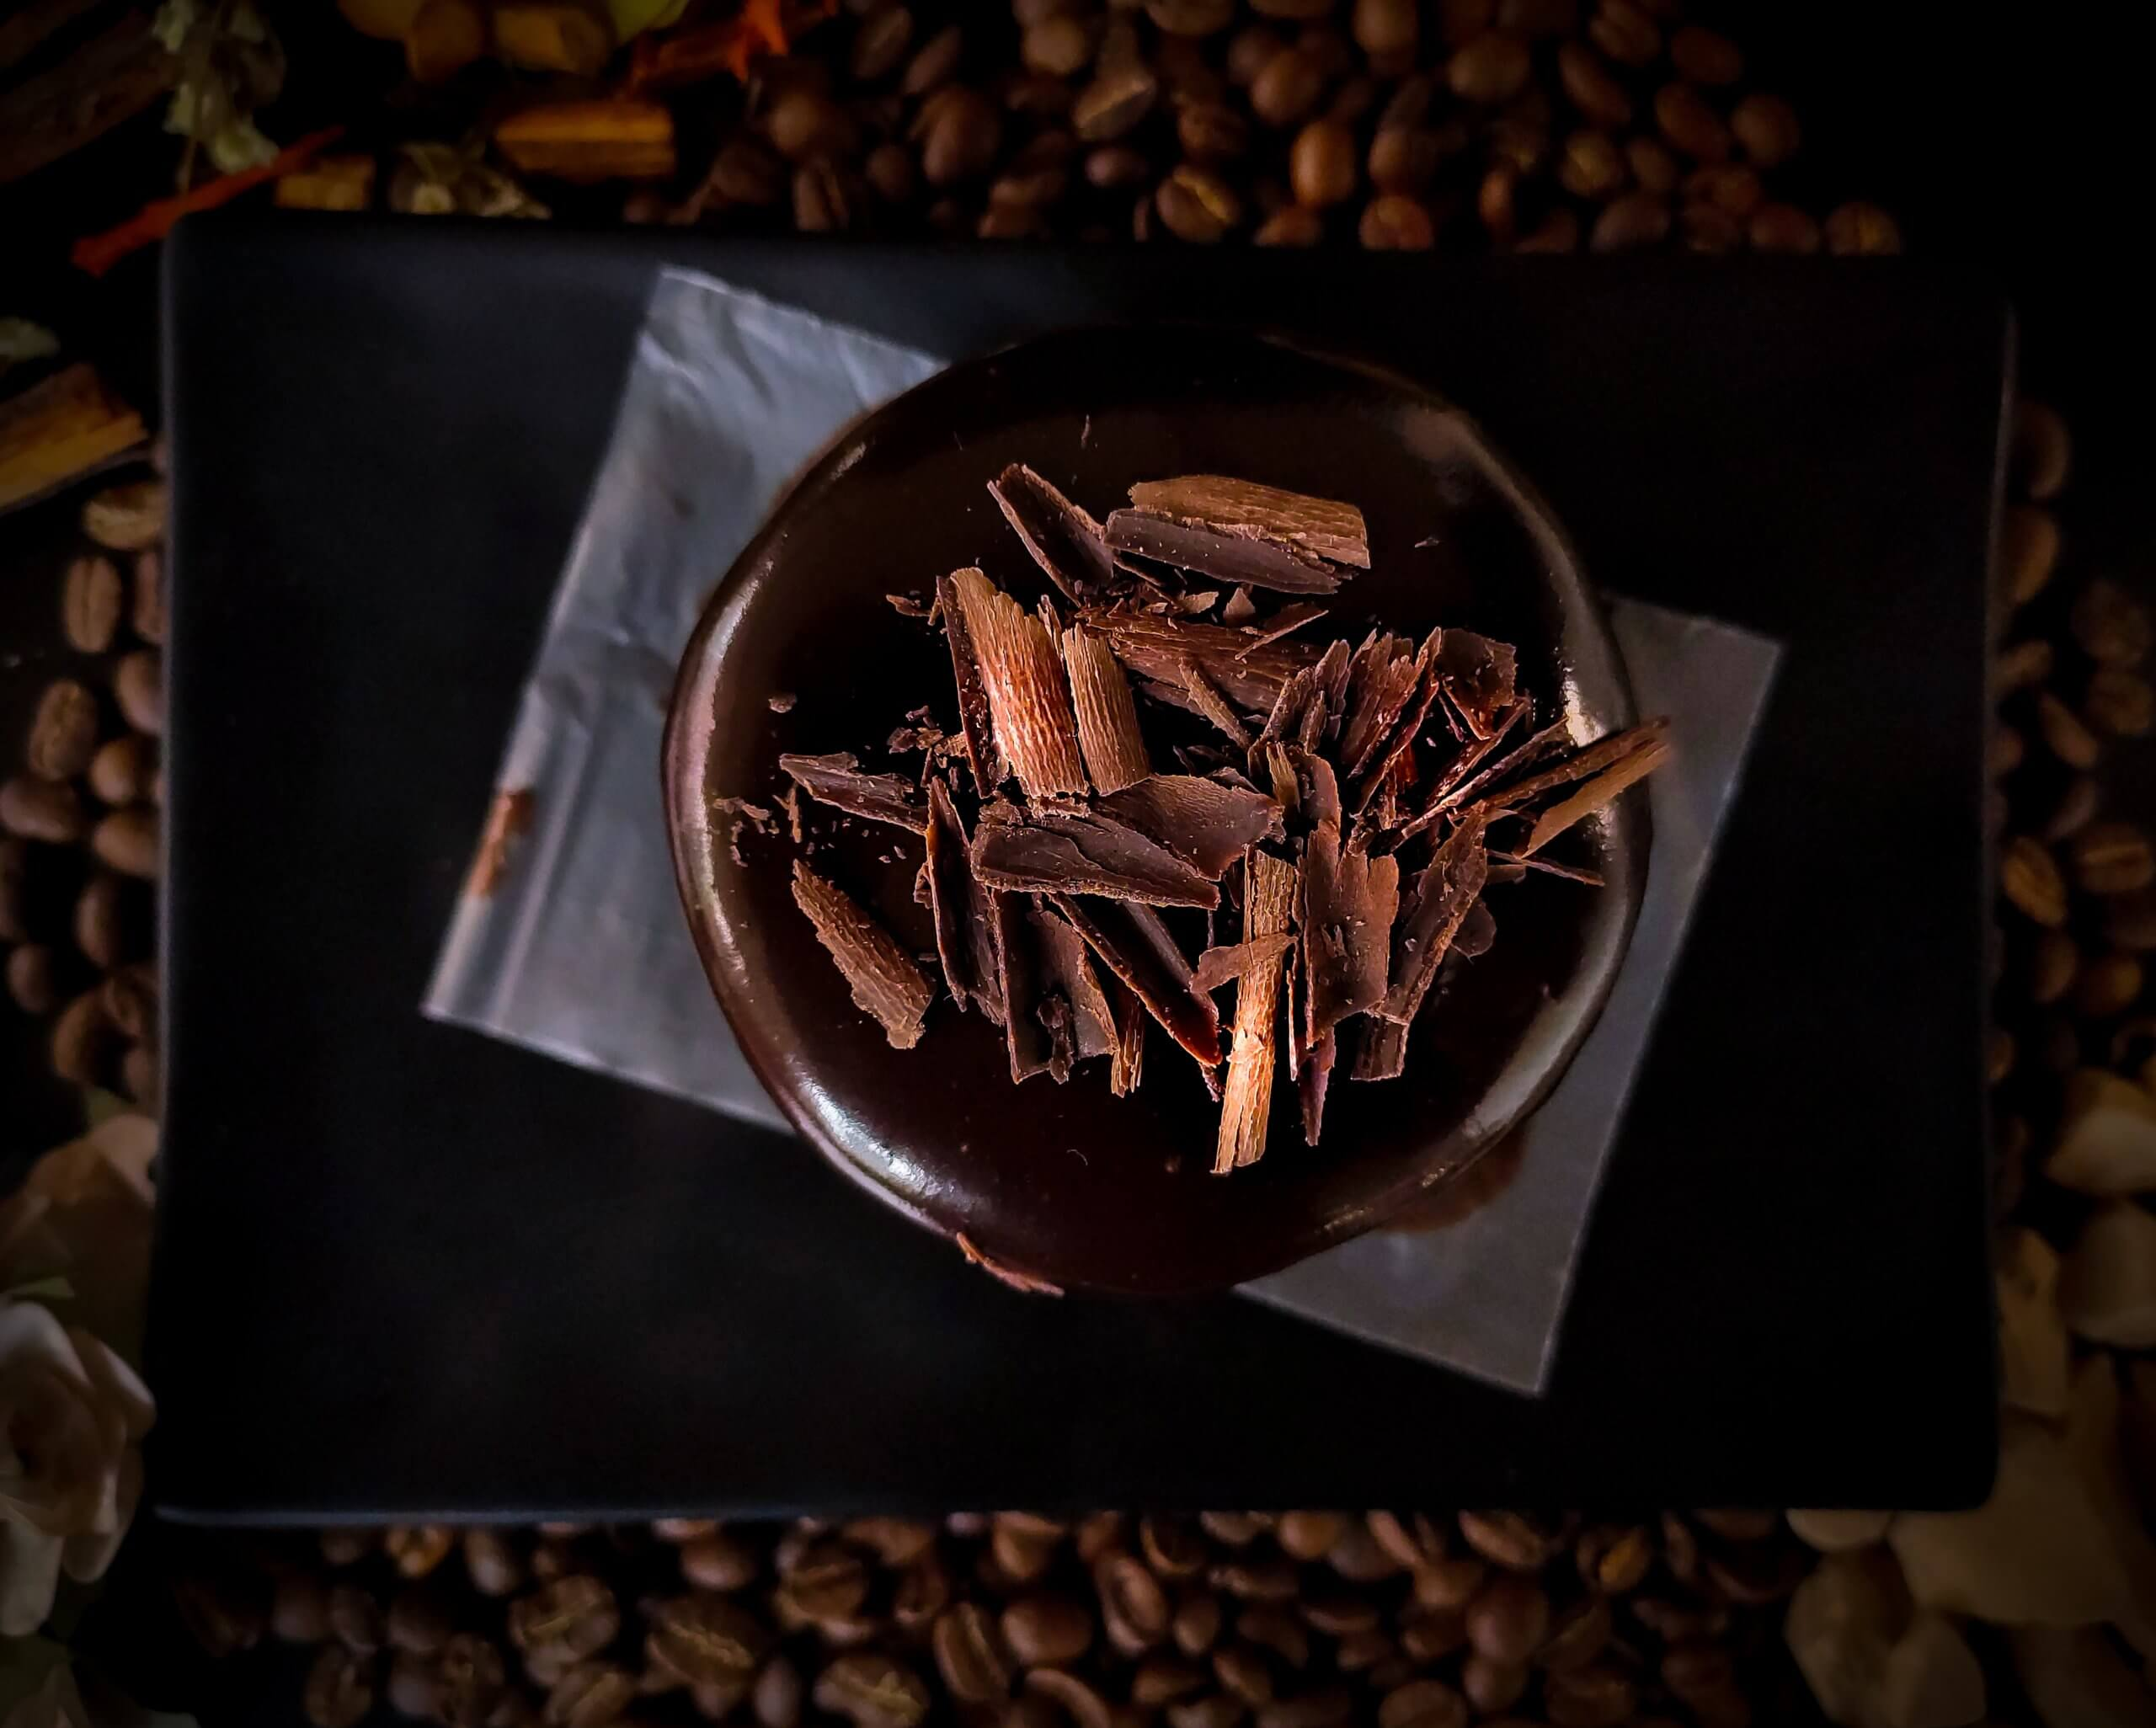 Deko Schokolade geraspelt